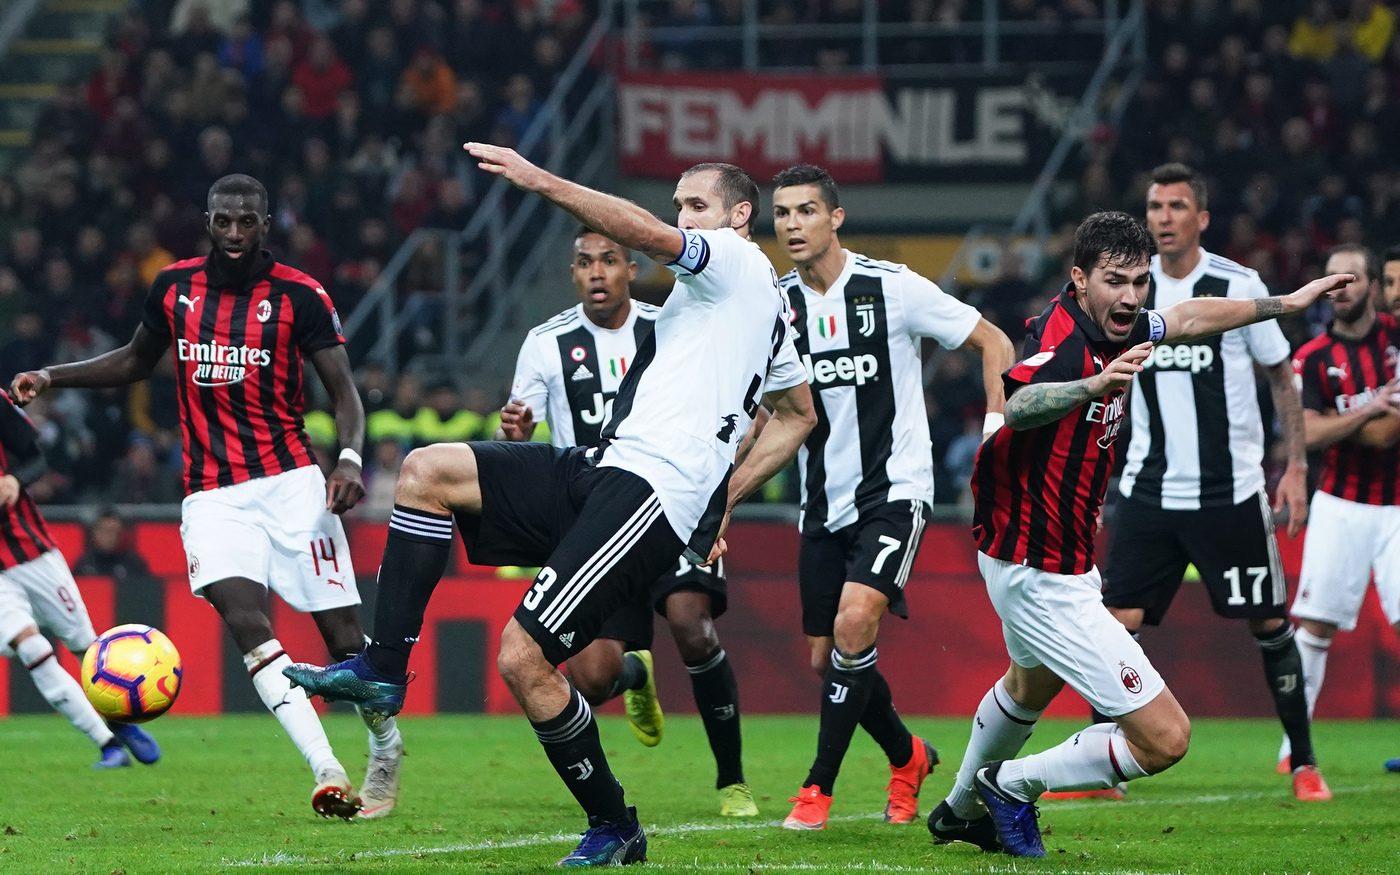 прогноз на 06.01.2021. «Милан» - «Ювентус»